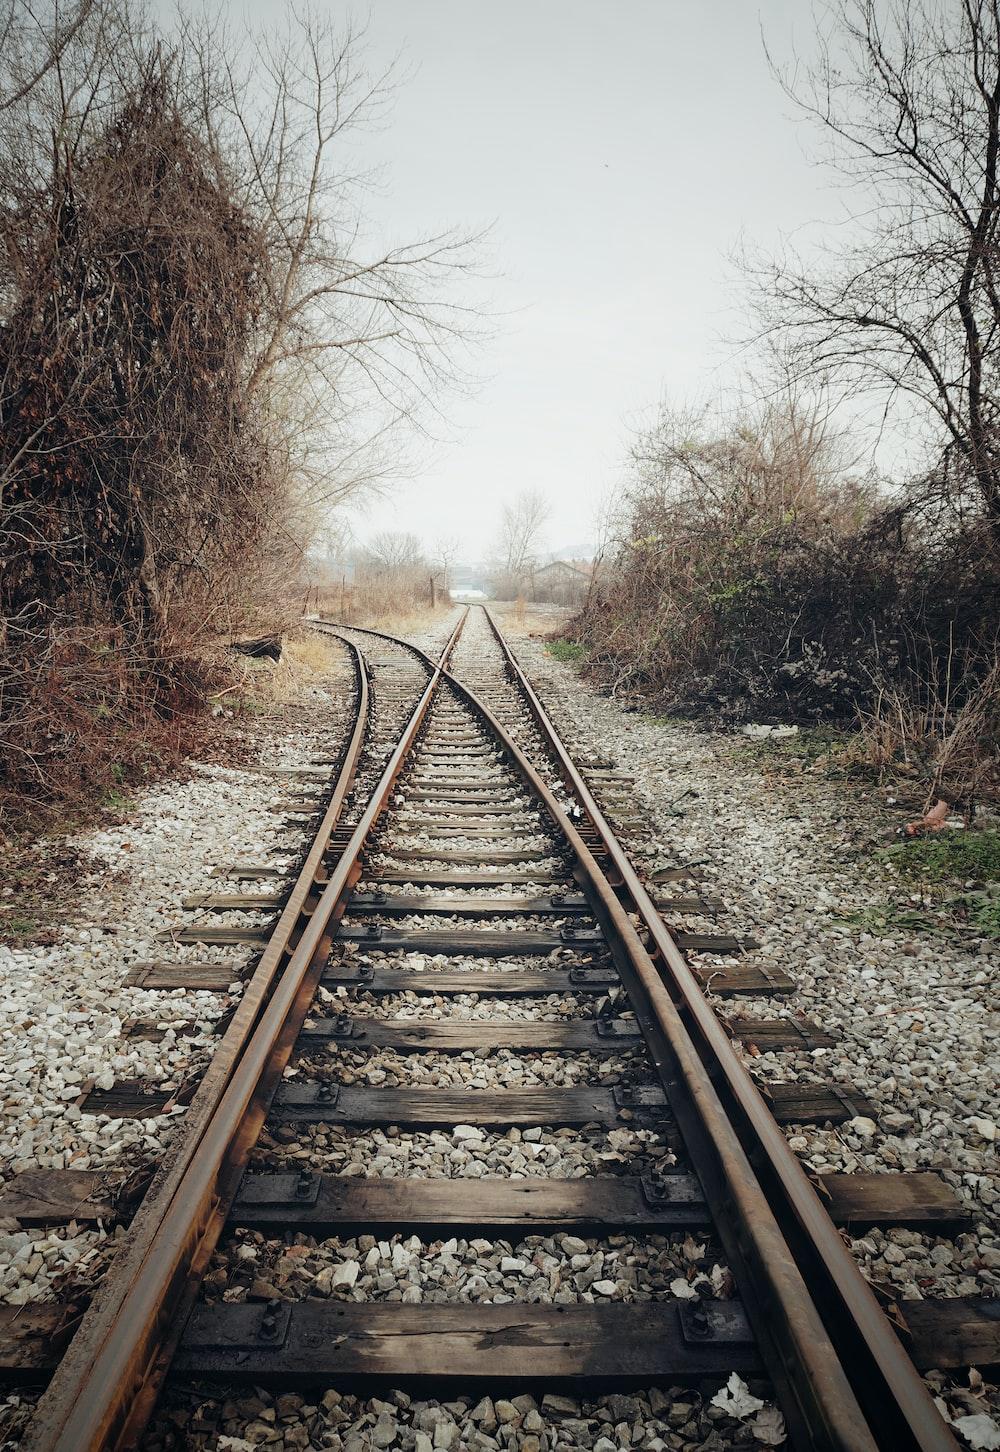 brown metal train rail between bare trees during daytime